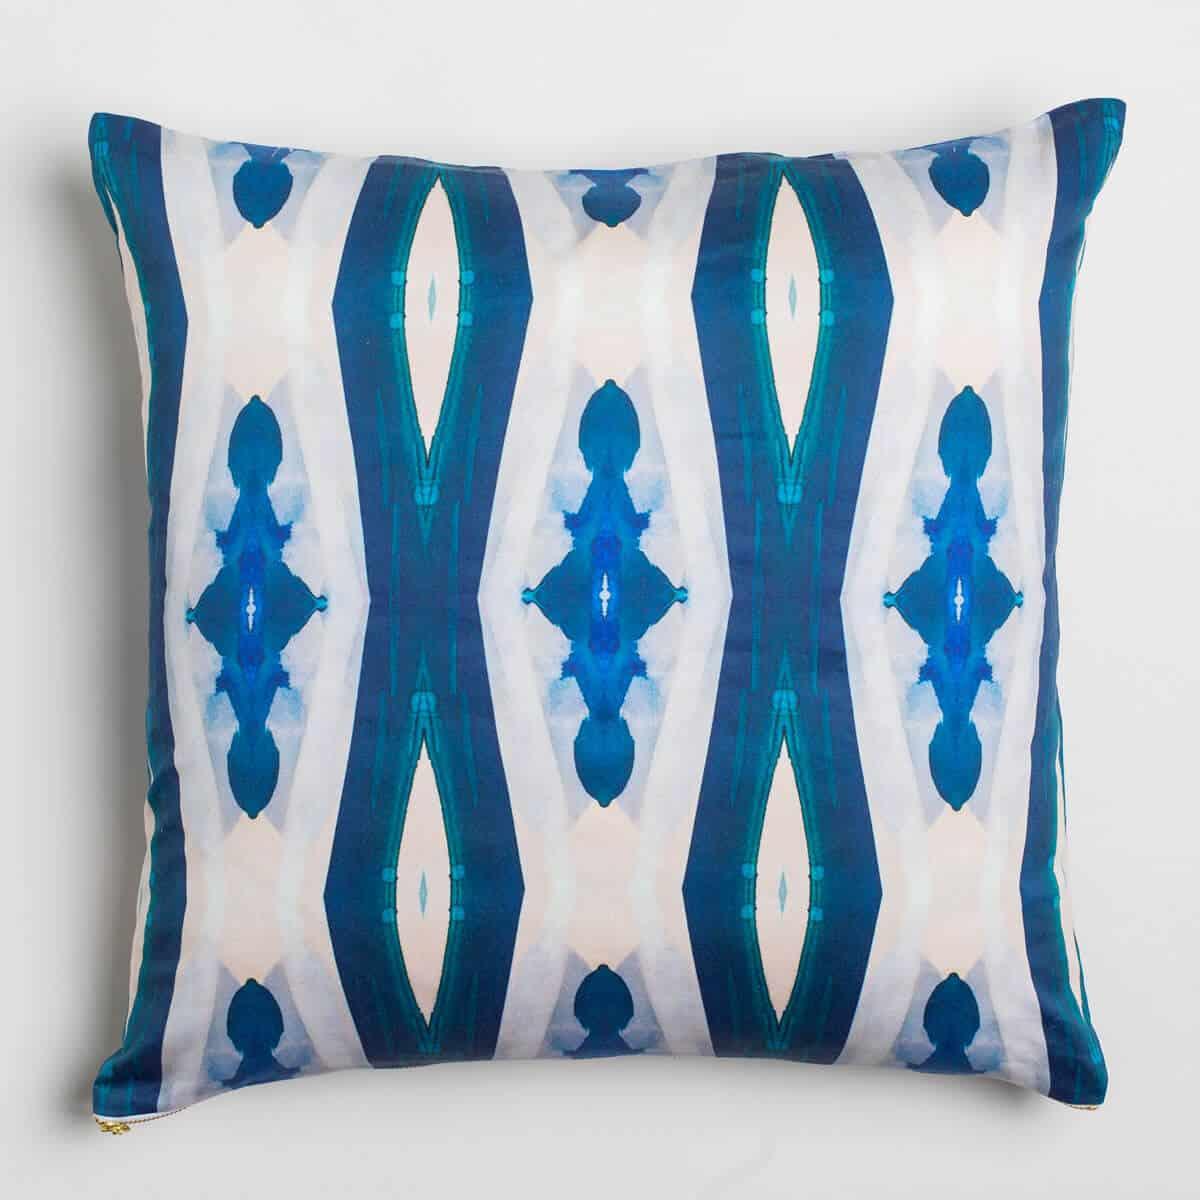 Luxury organic blue ogee diamond pattern square pillow